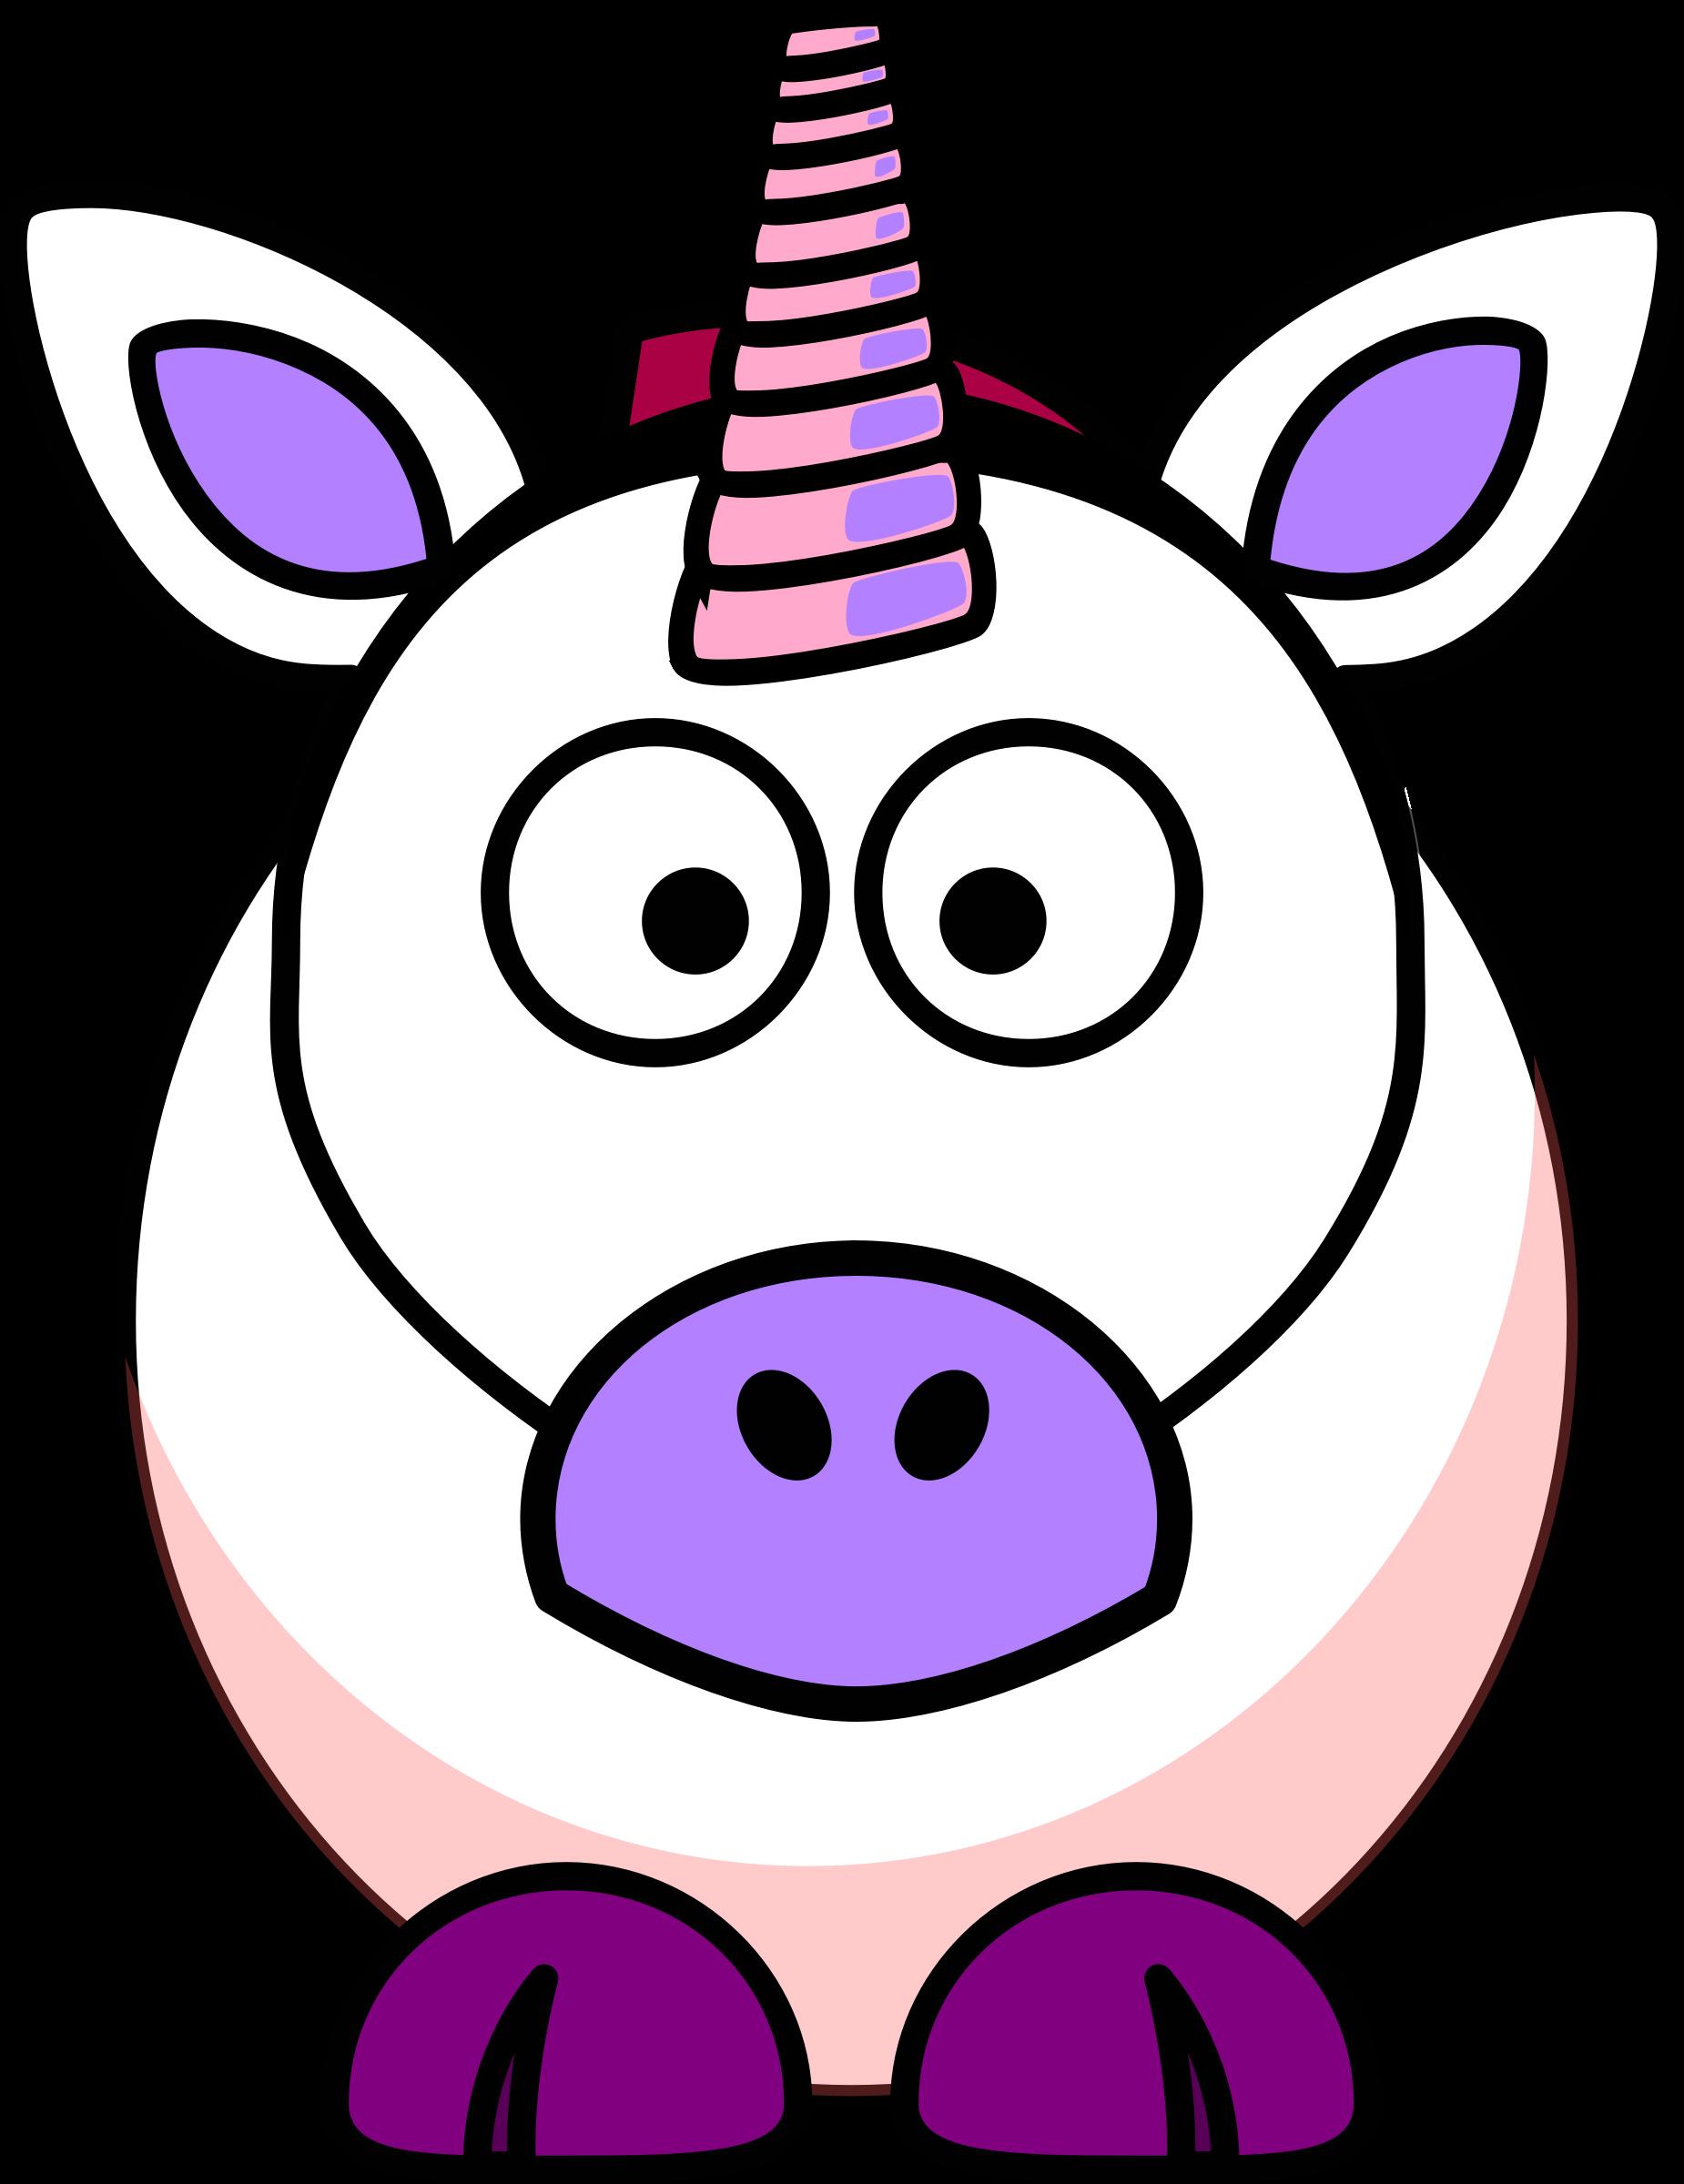 Fans gclipart com . Clipart unicorn animated